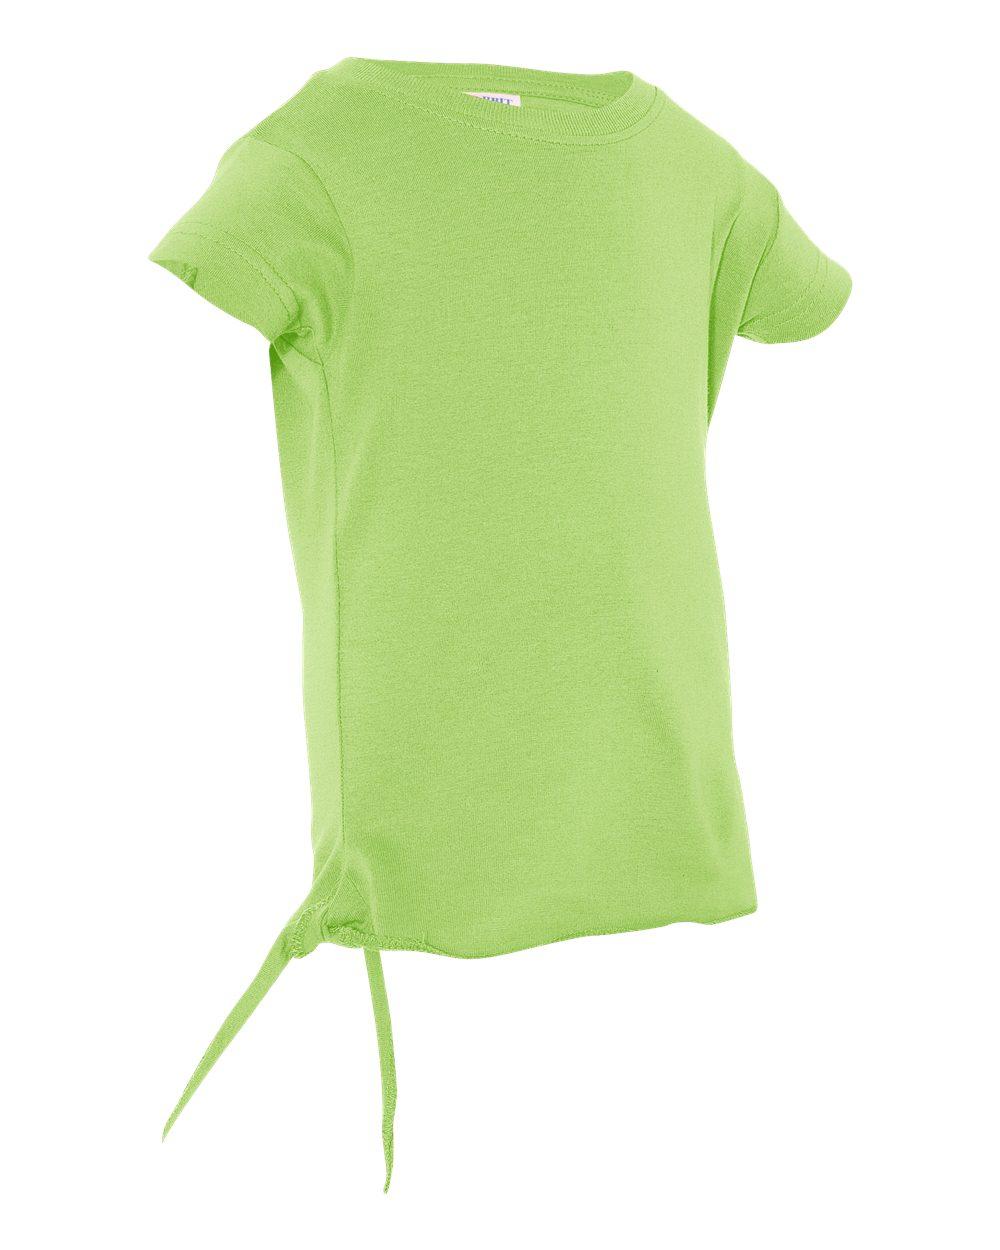 Rabbit Skins 3325 - Toddler Jersey Side Tie T-Shirt $3.80 ...